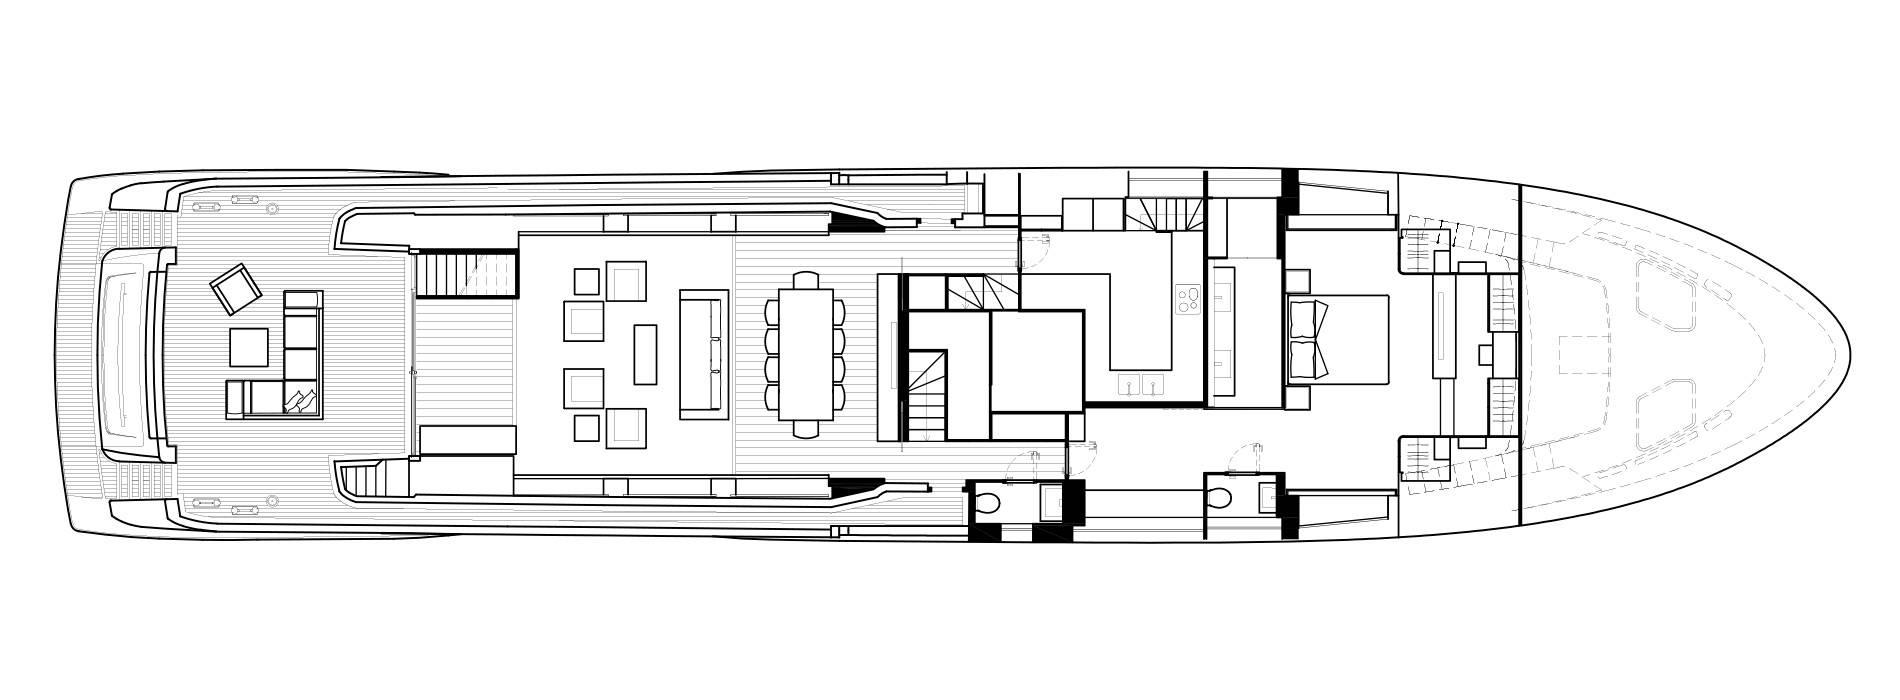 Sanlorenzo Yachts SL118 Cubierta principal